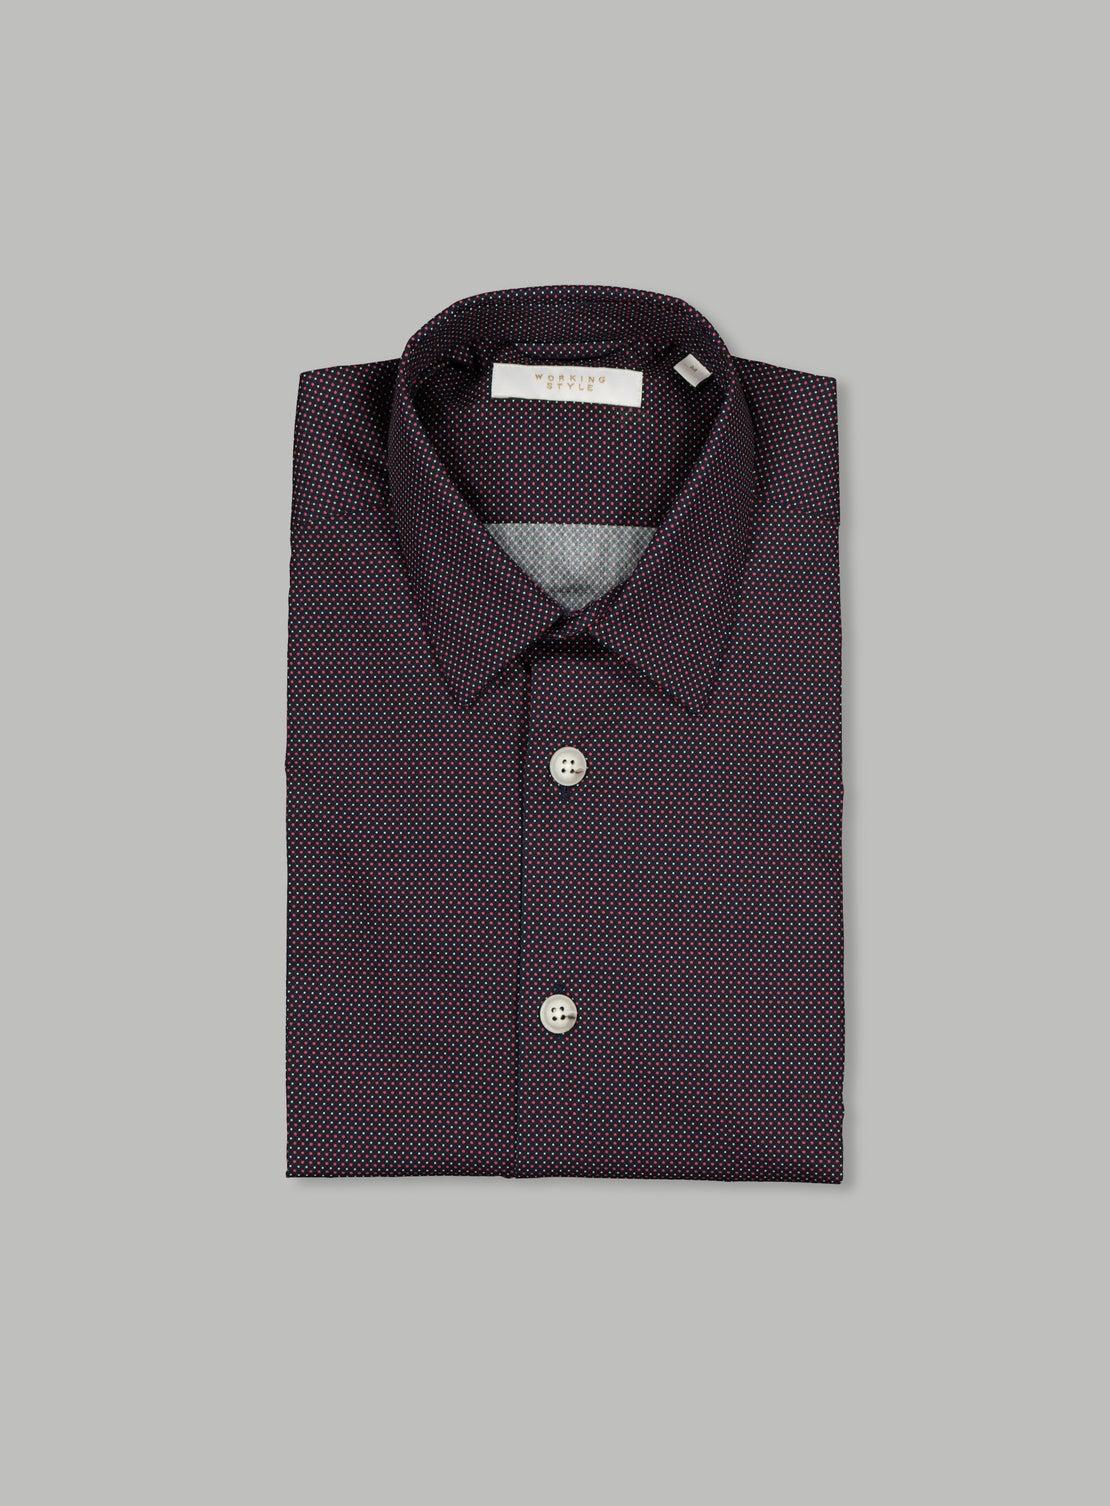 Navy/Red/White Dots Shirt